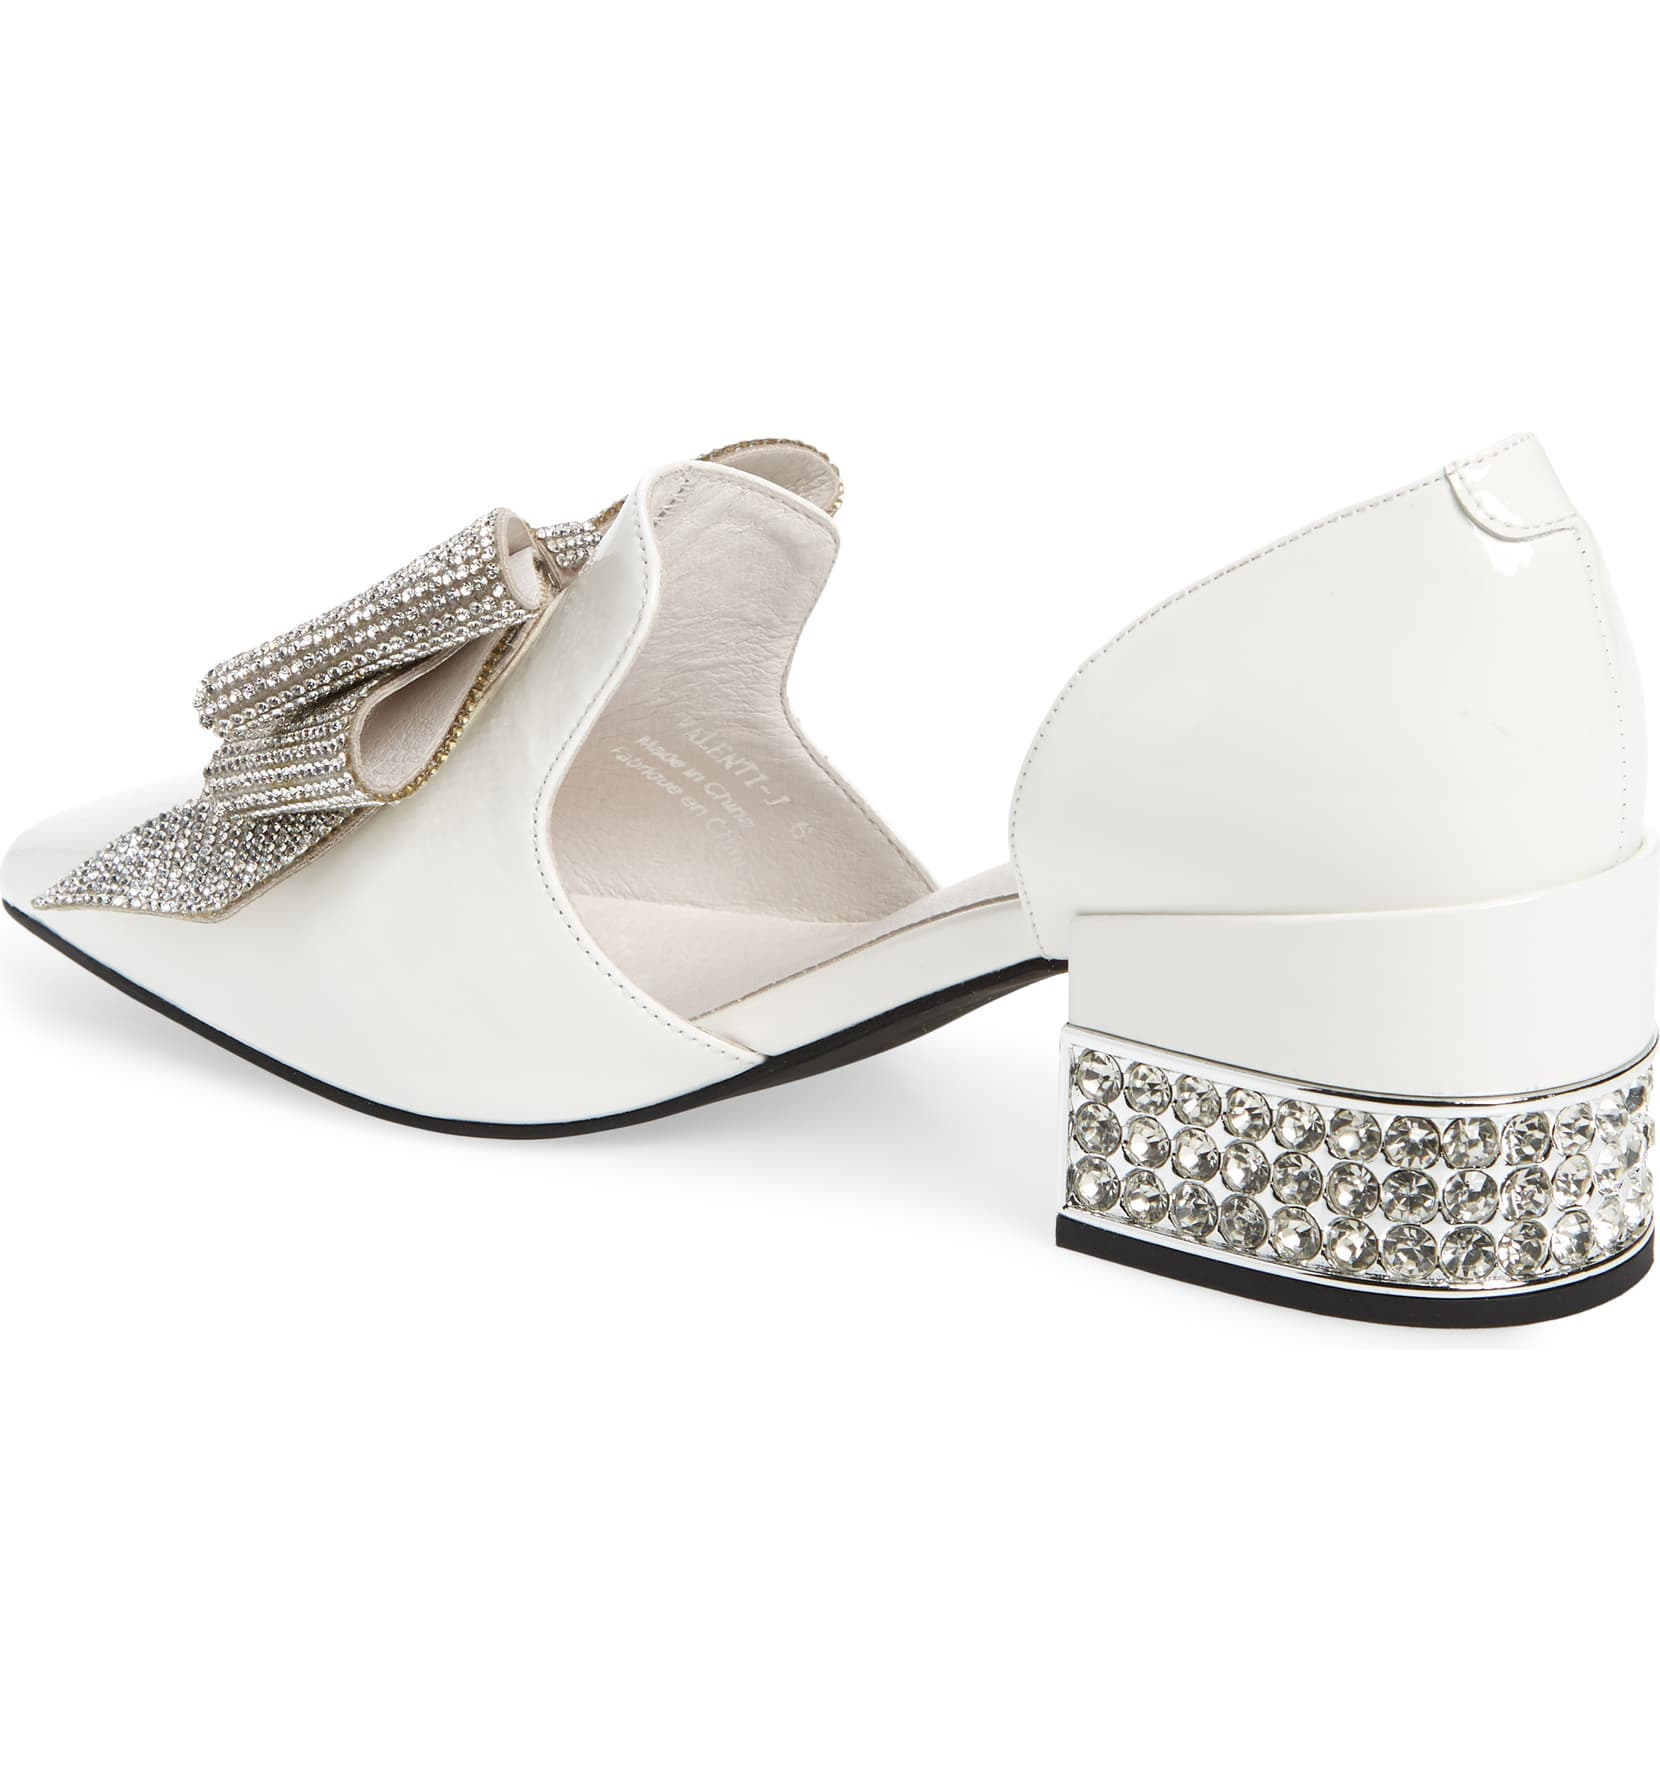 Jeffery-Campbell-Valenti-White-Silver-Patent-Bow-Metallic-Heel-Loafer thumbnail 3